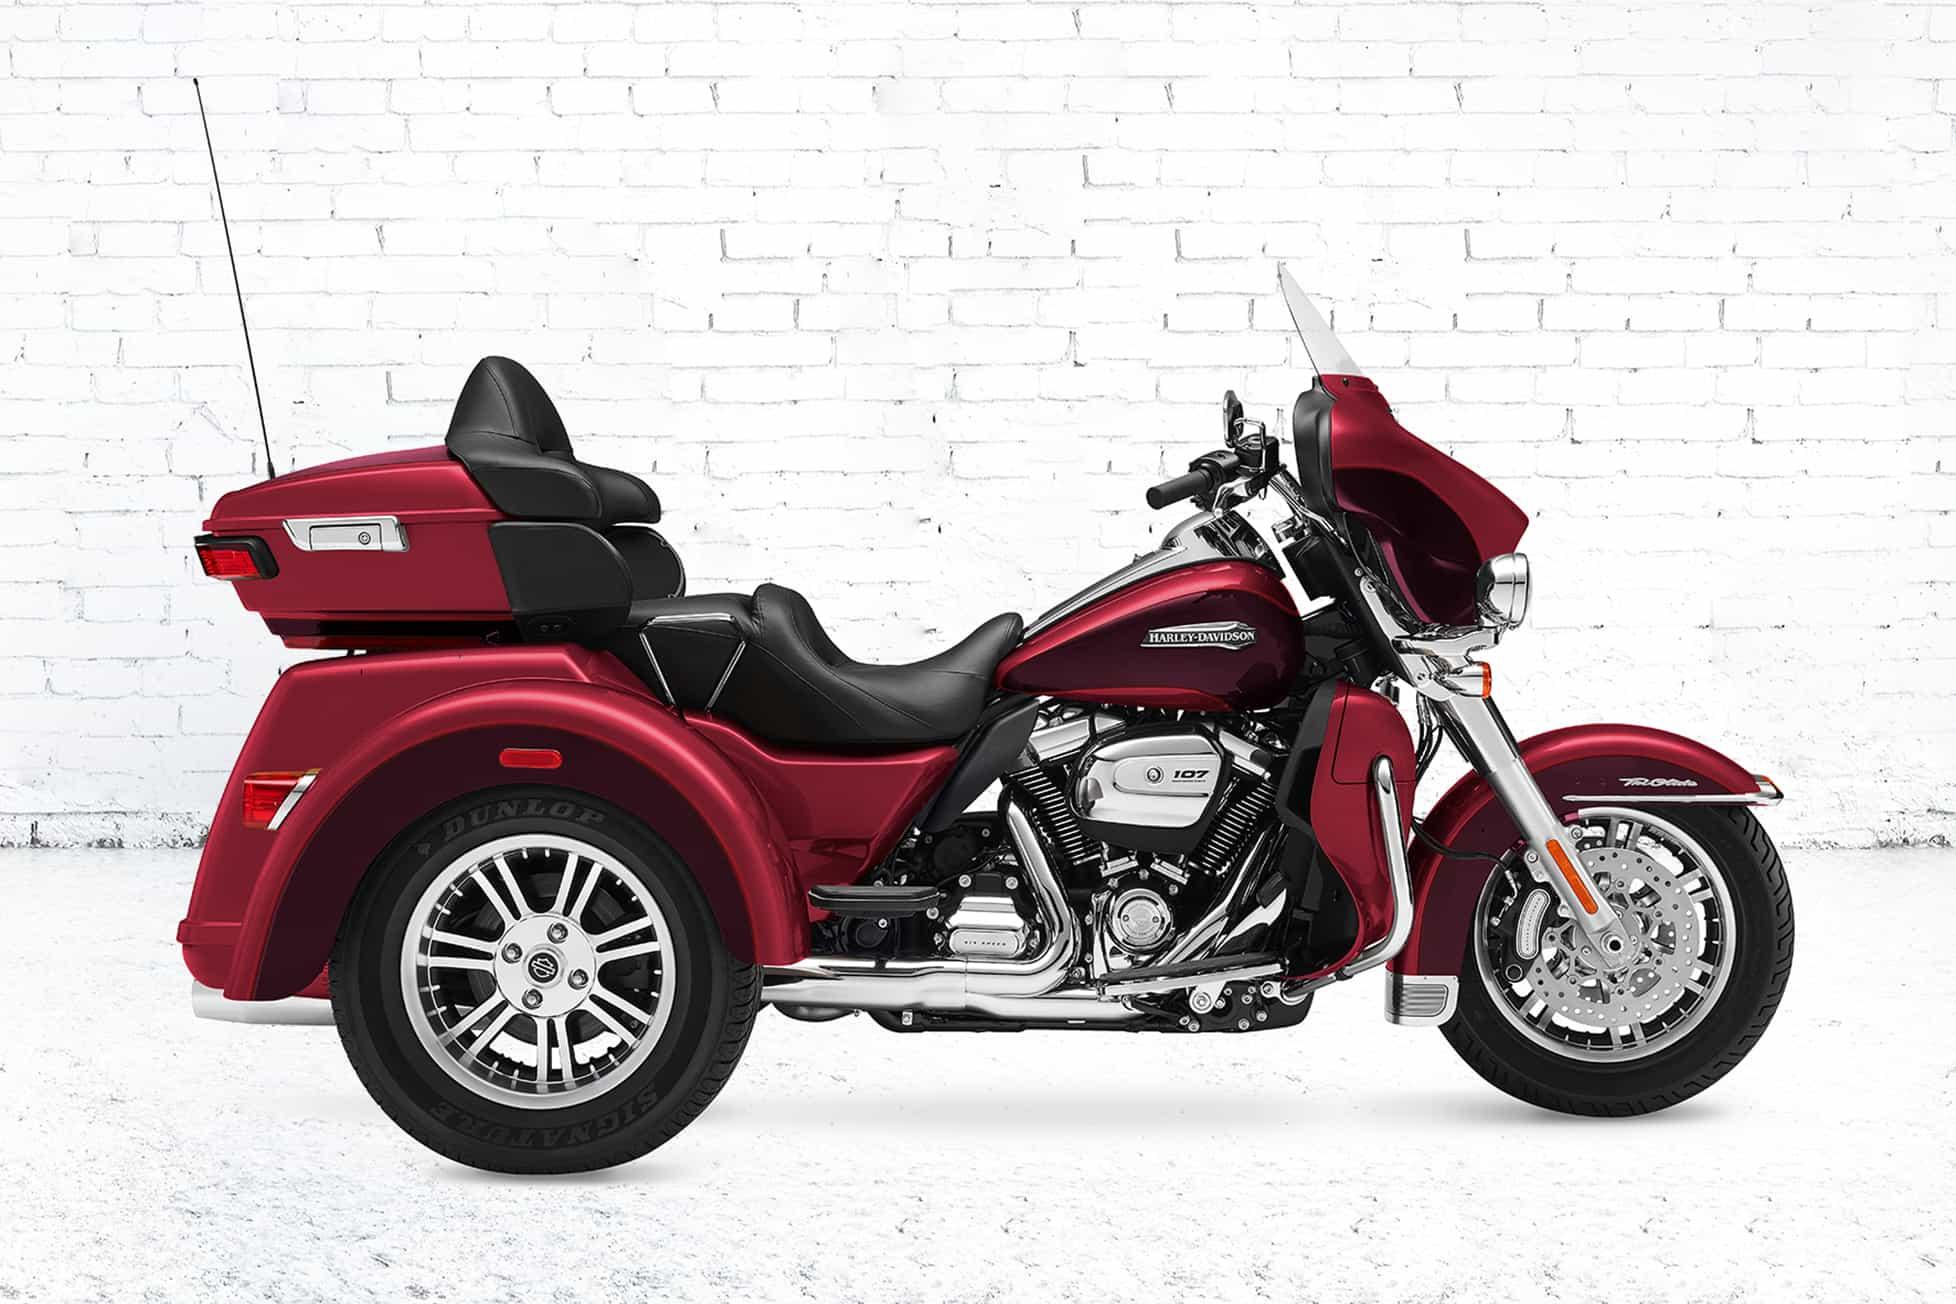 2012 Harley Trike Wiring Diagram 1999 Softail 2018 Tri Glide Ultra Specs Pricing Davidson Usa Rh Com 2000 Titan Gecko Diagrams